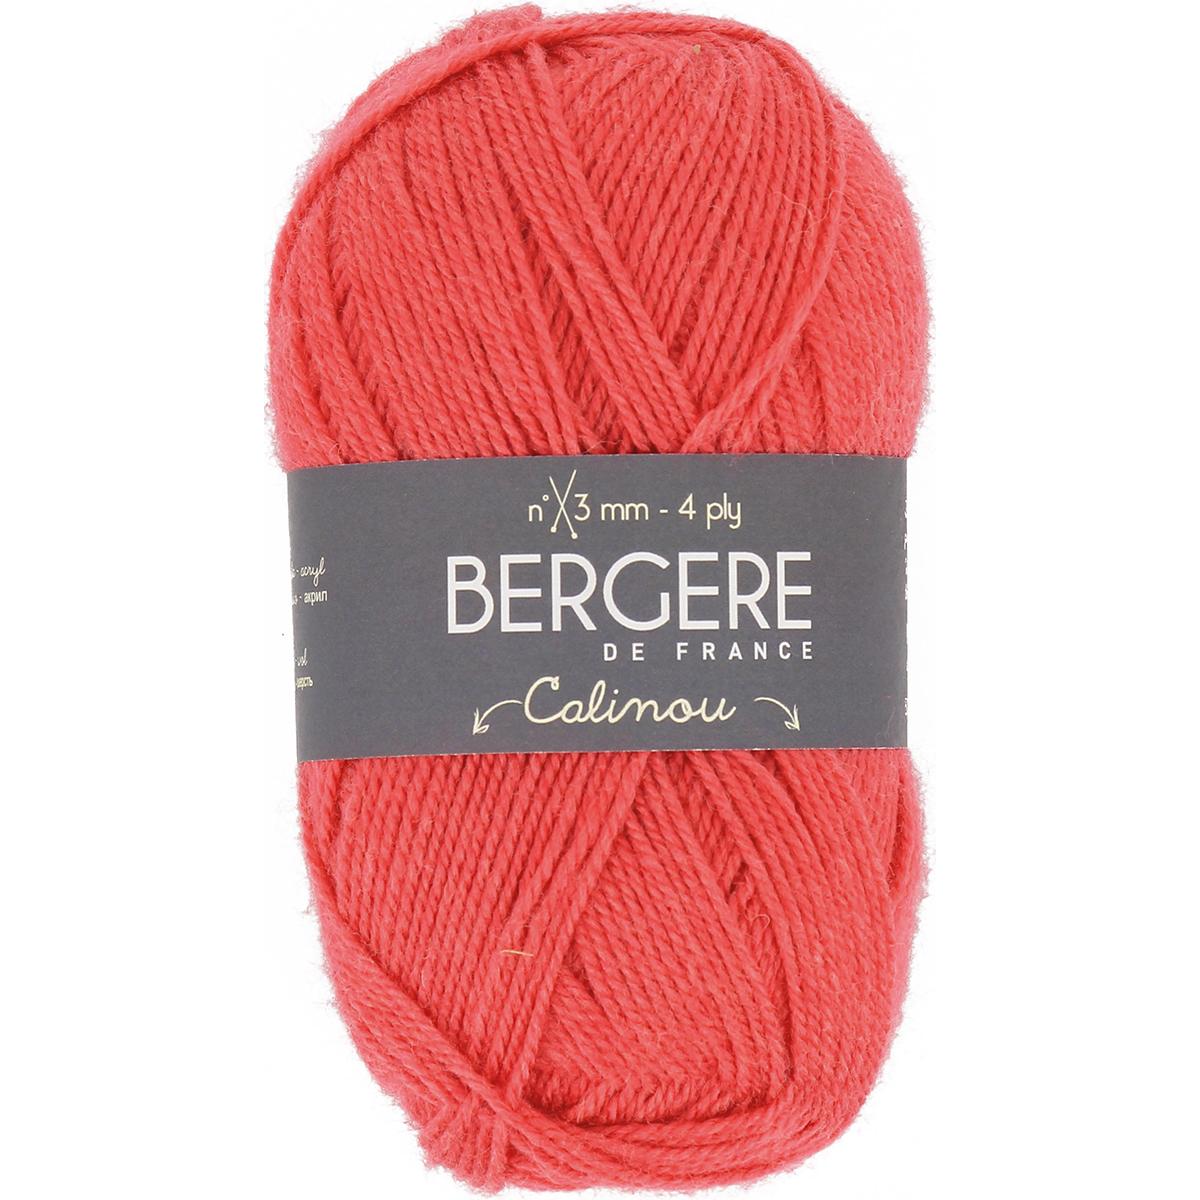 Bergere De France Calinou Yarn-Begonia